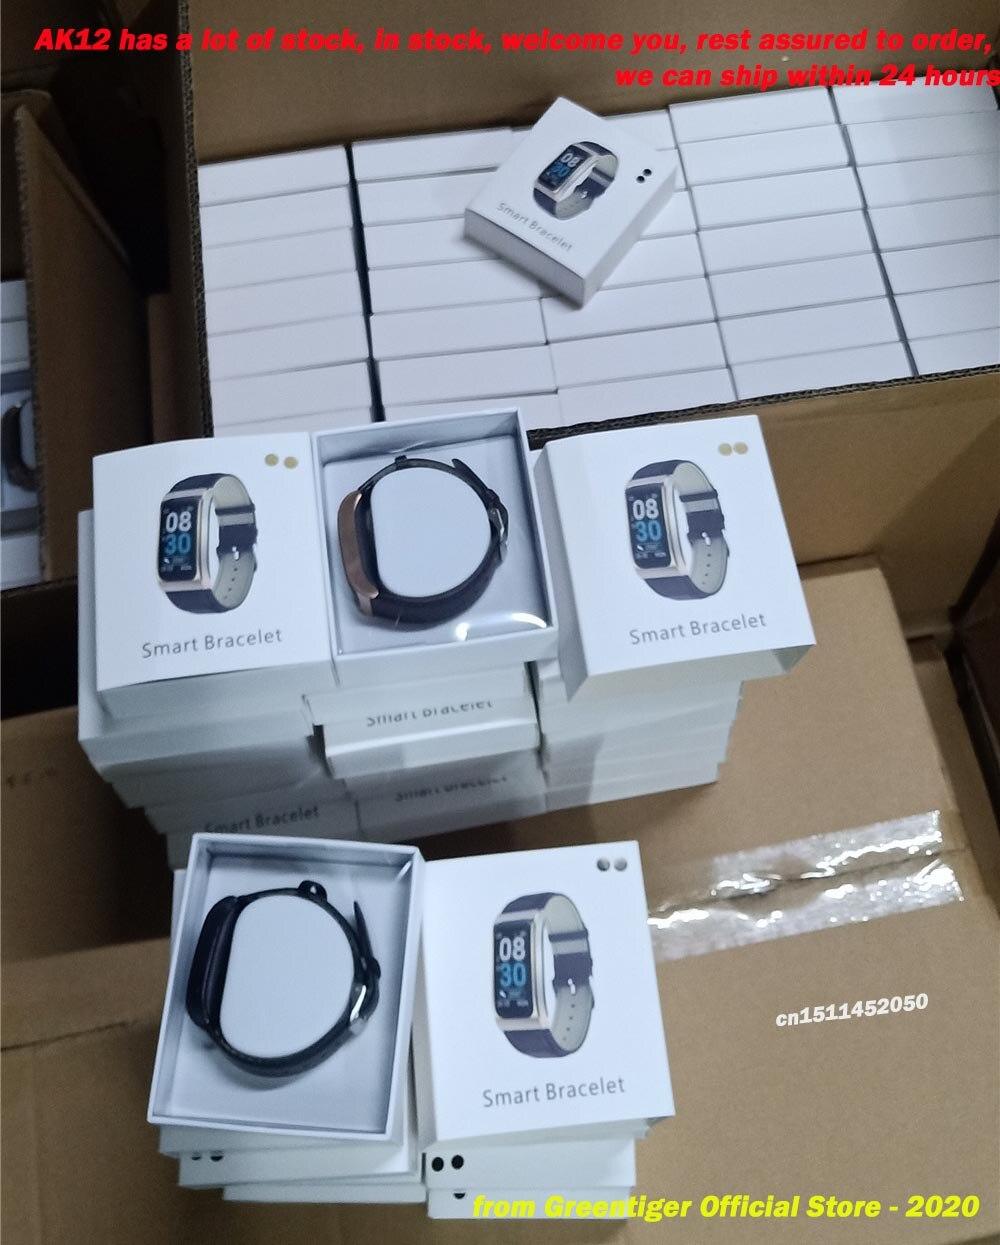 Hf36f22a67cde4ec486b54290a559244fn Greentiger AK12 Smart bracelet Men Women IP68 Waterproof Blood Pressure menstrual cycle monitor Fitness Tracker Smart band